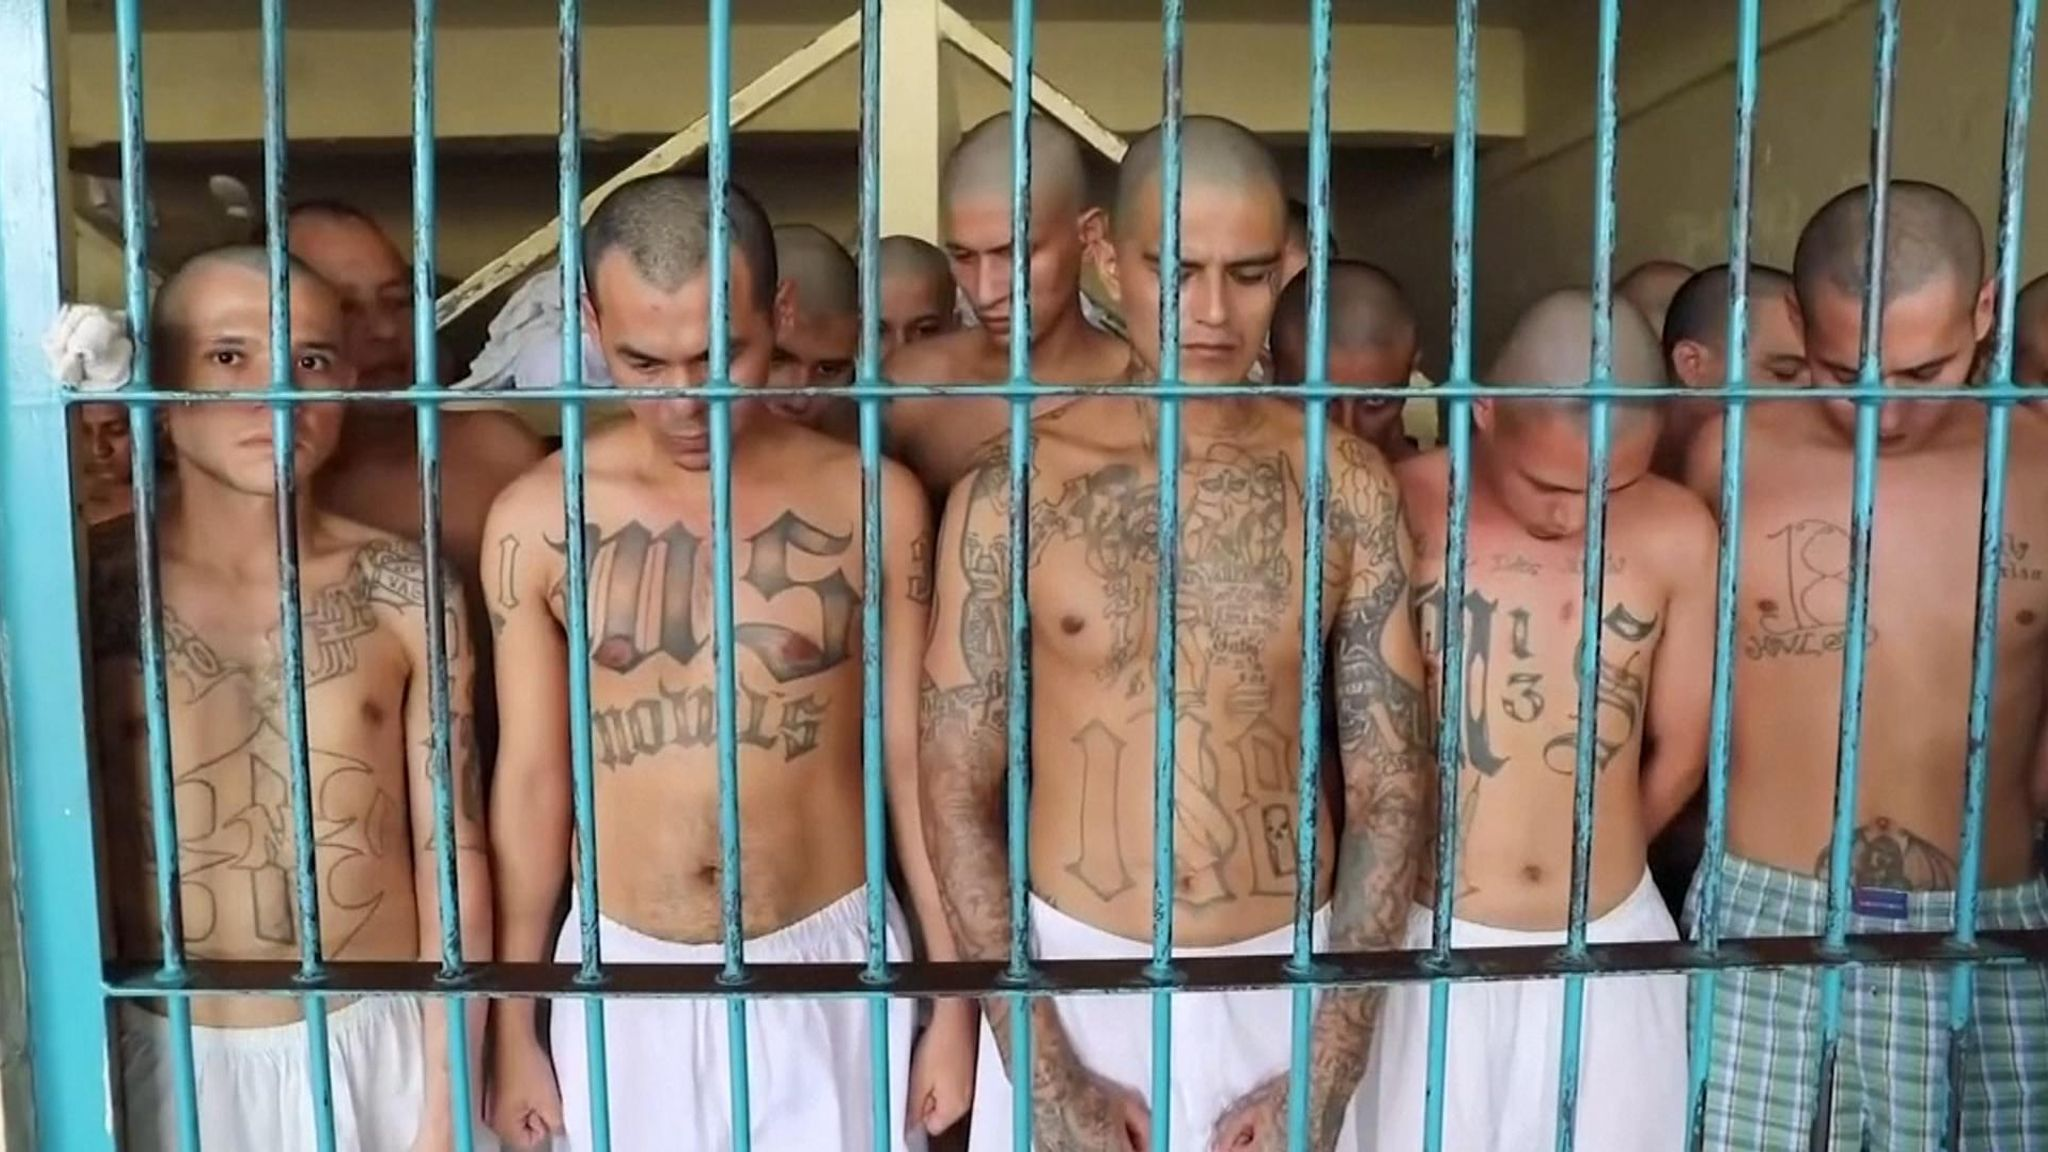 El Salvador authorises 'lethal force' in gang crime crackdown after dozens  of murders | World News | Sky News